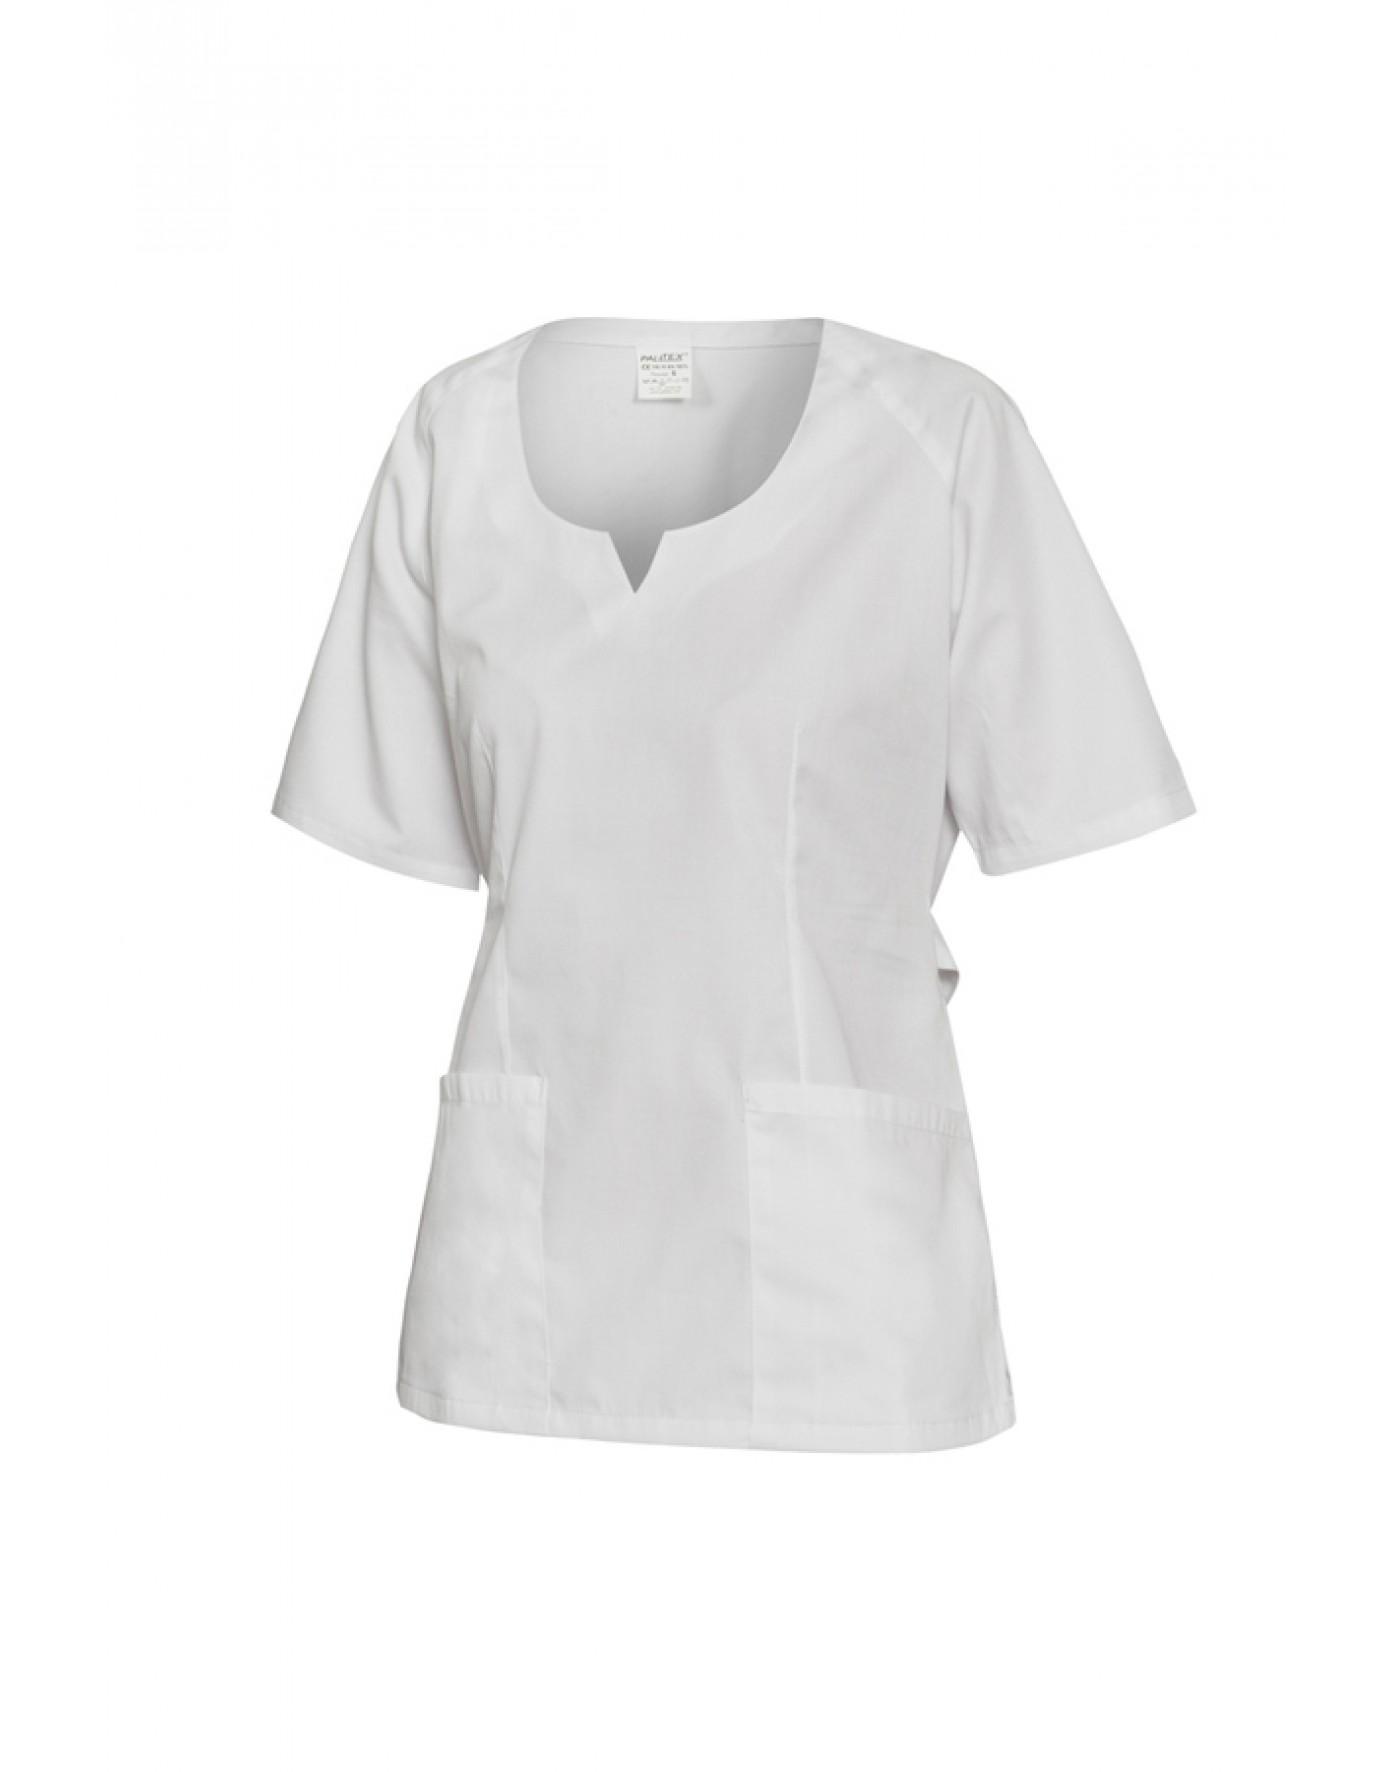 Bluza personal medical fabia